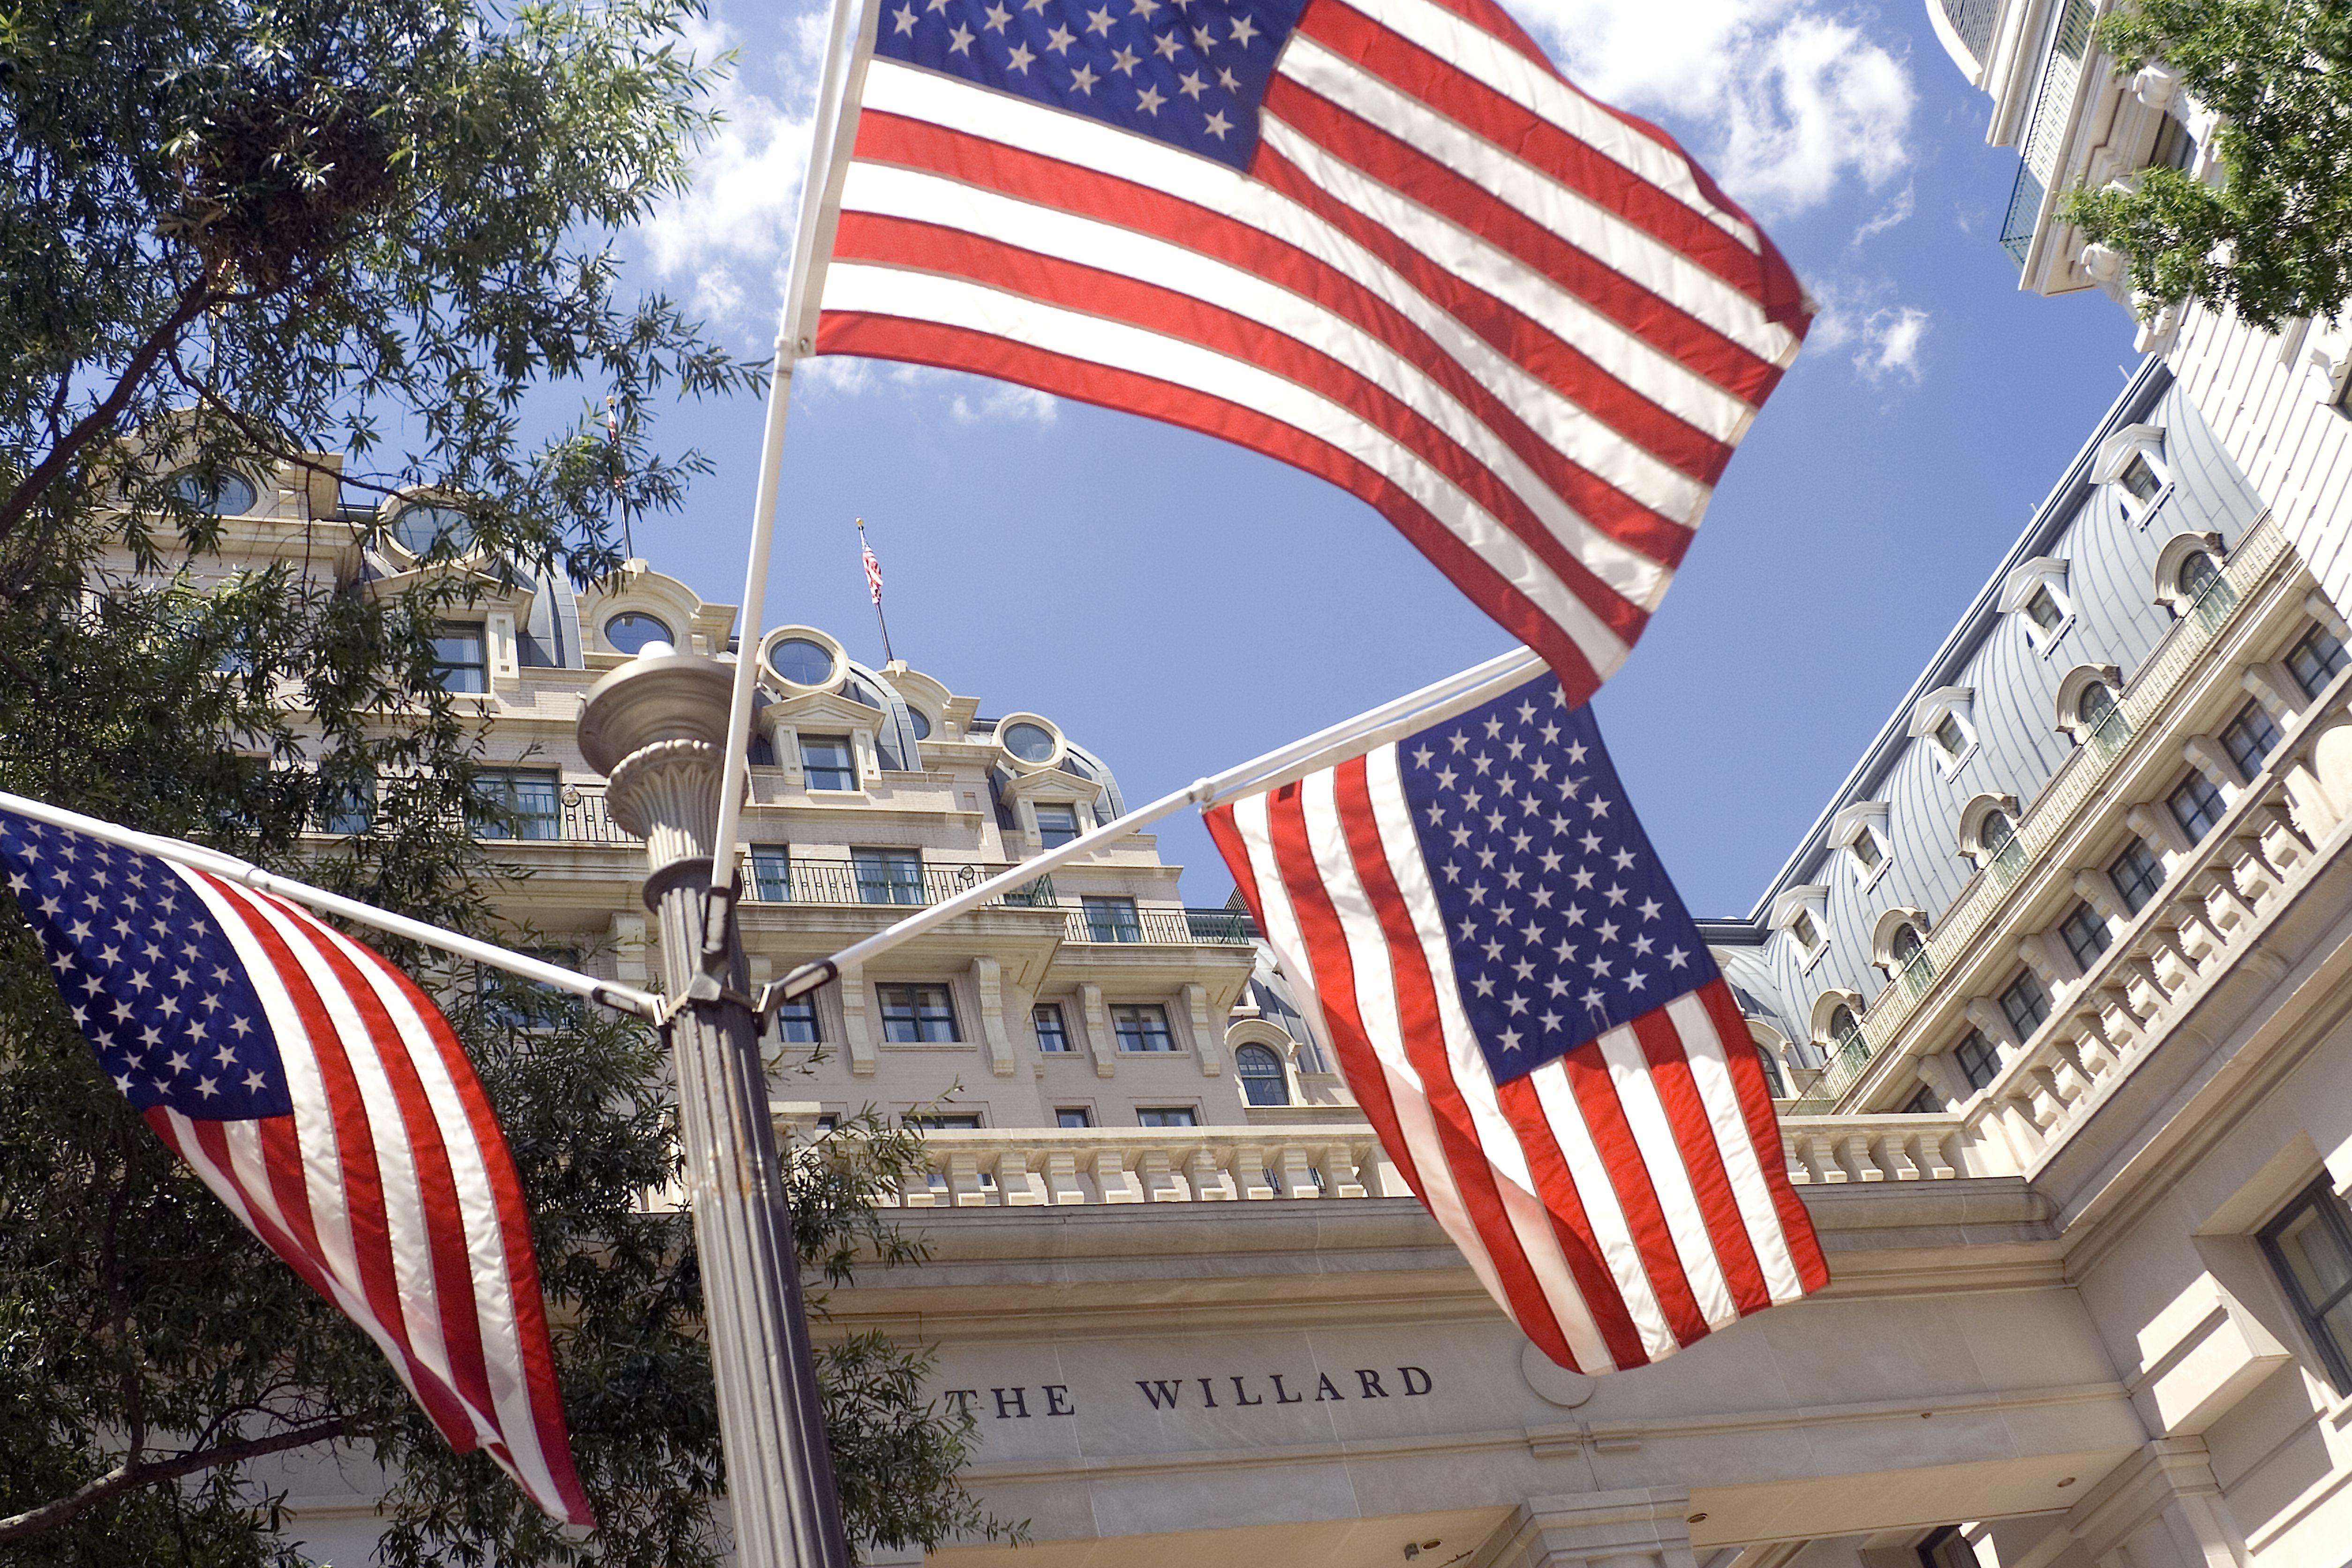 USA, Washington DC, American flags outside The Willard hotel